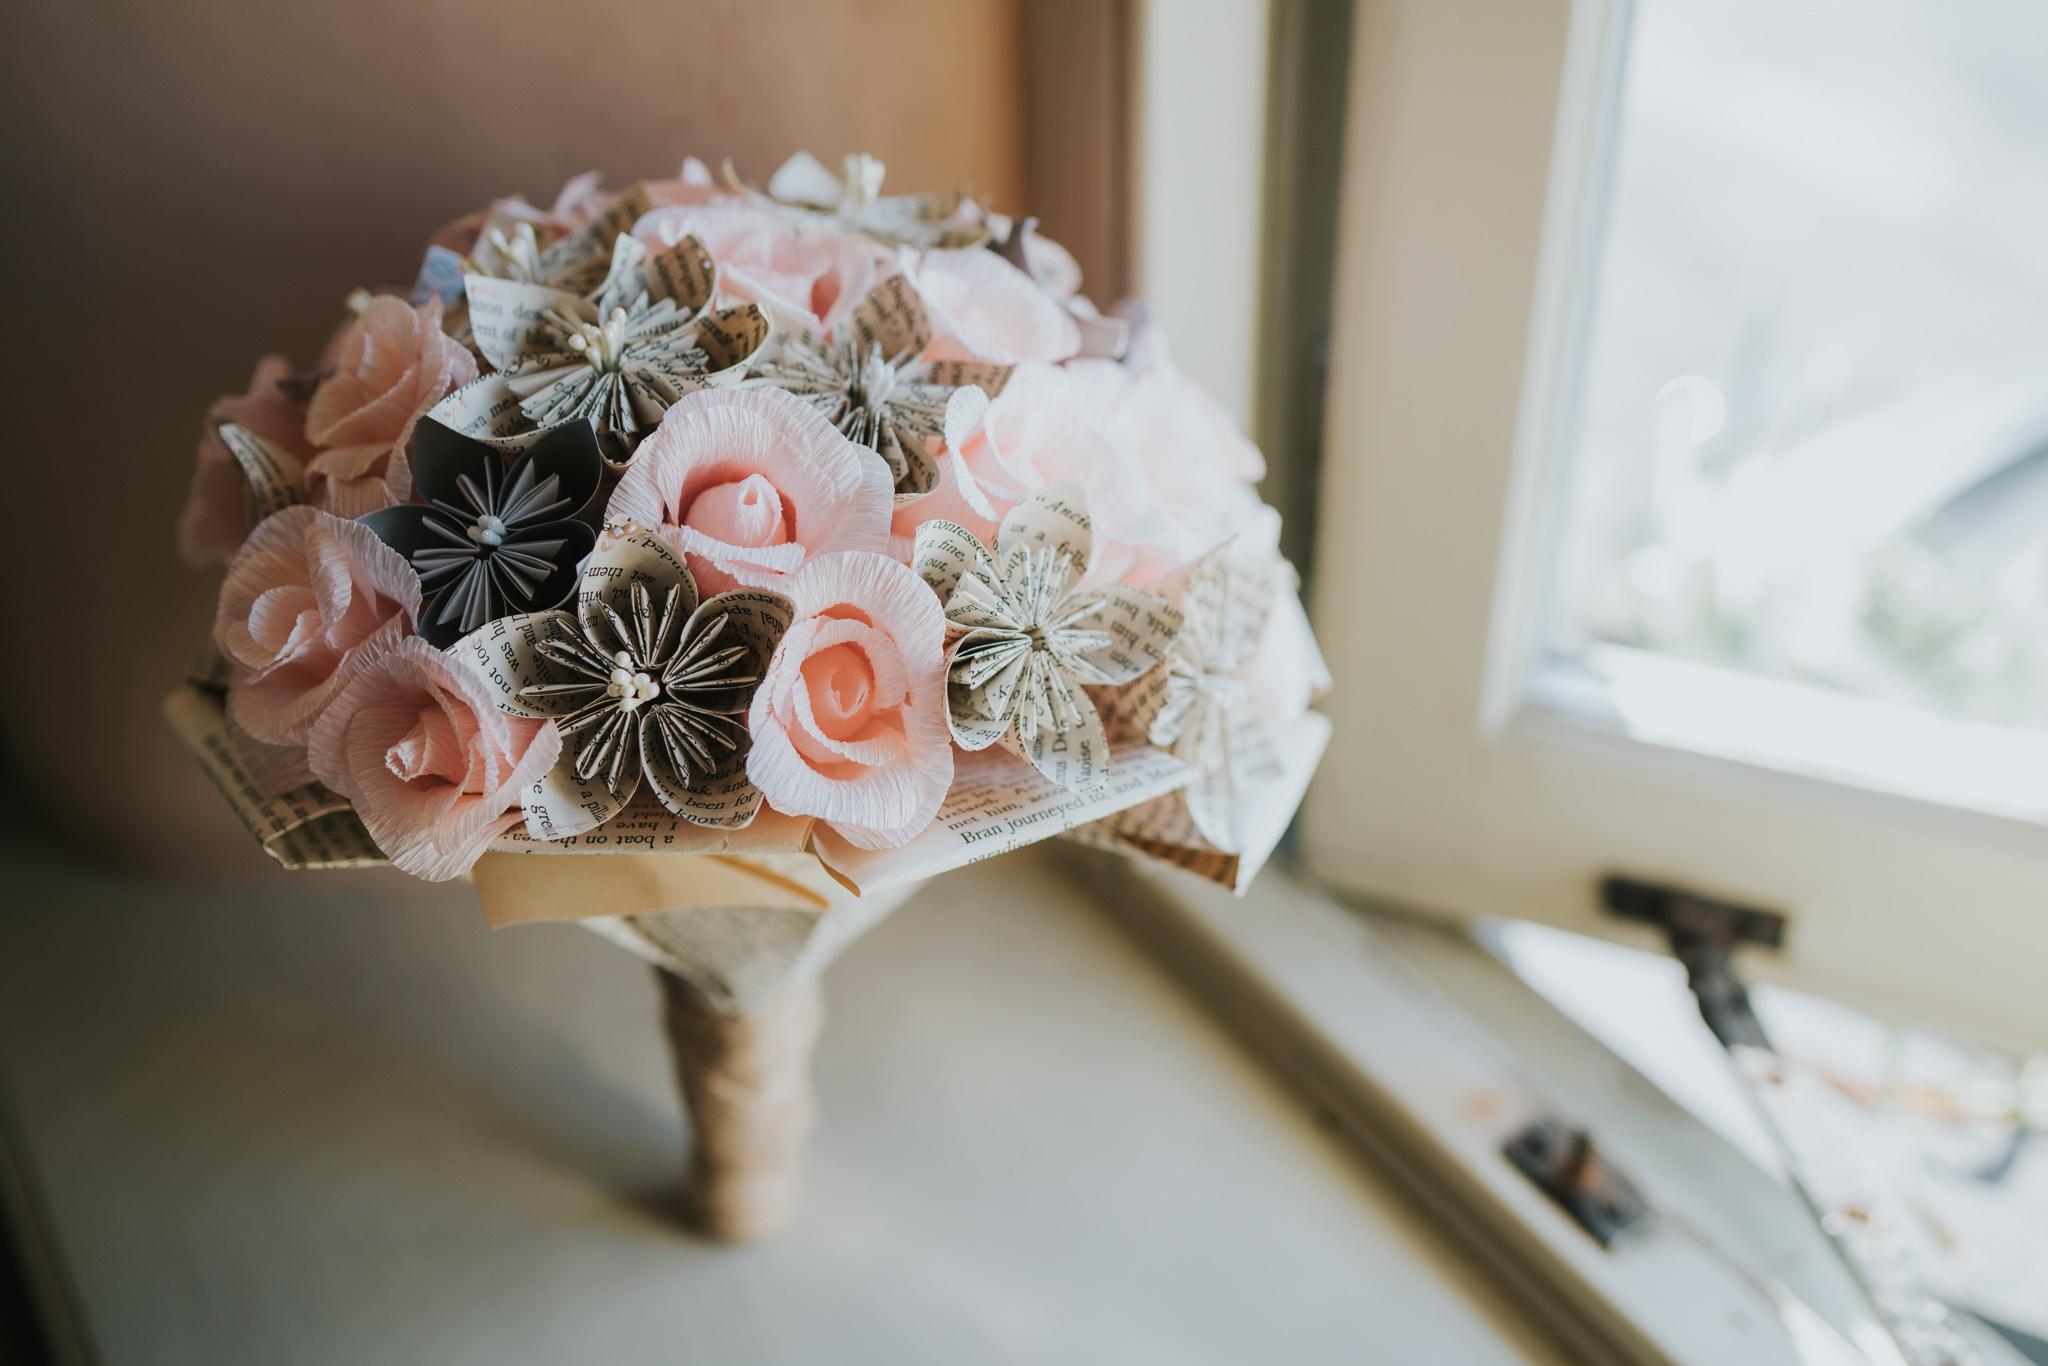 grace-sam-old-barn-clovelly-devon-wedding-photographer-grace-elizabeth-essex-suffolk-norfolk-wedding-photographer (4 of 132).jpg